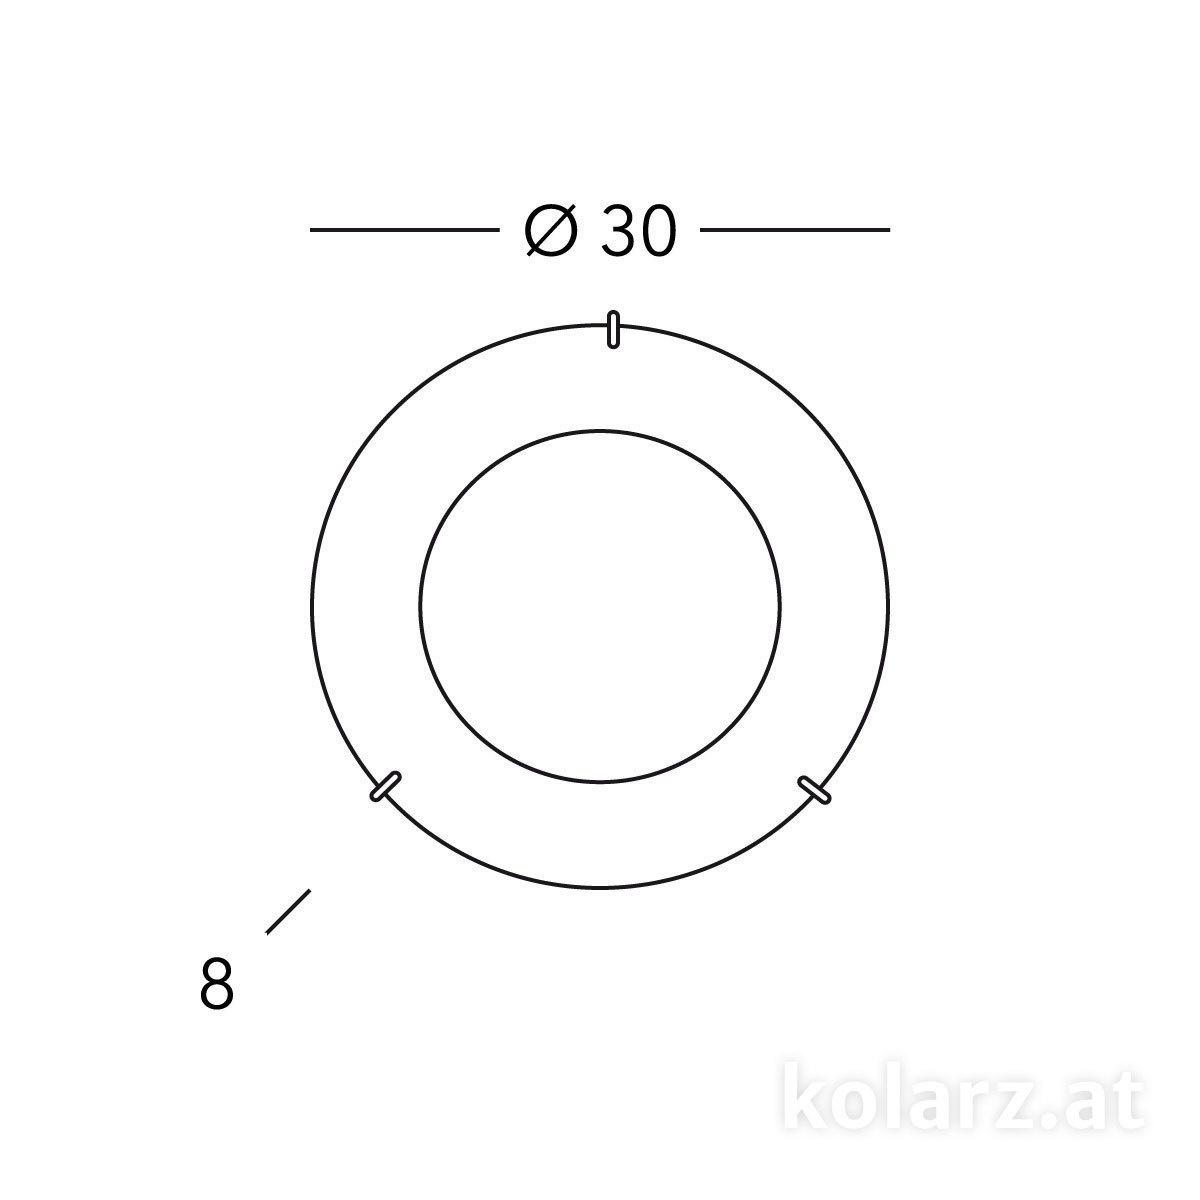 A1306-11-3-s1.jpg